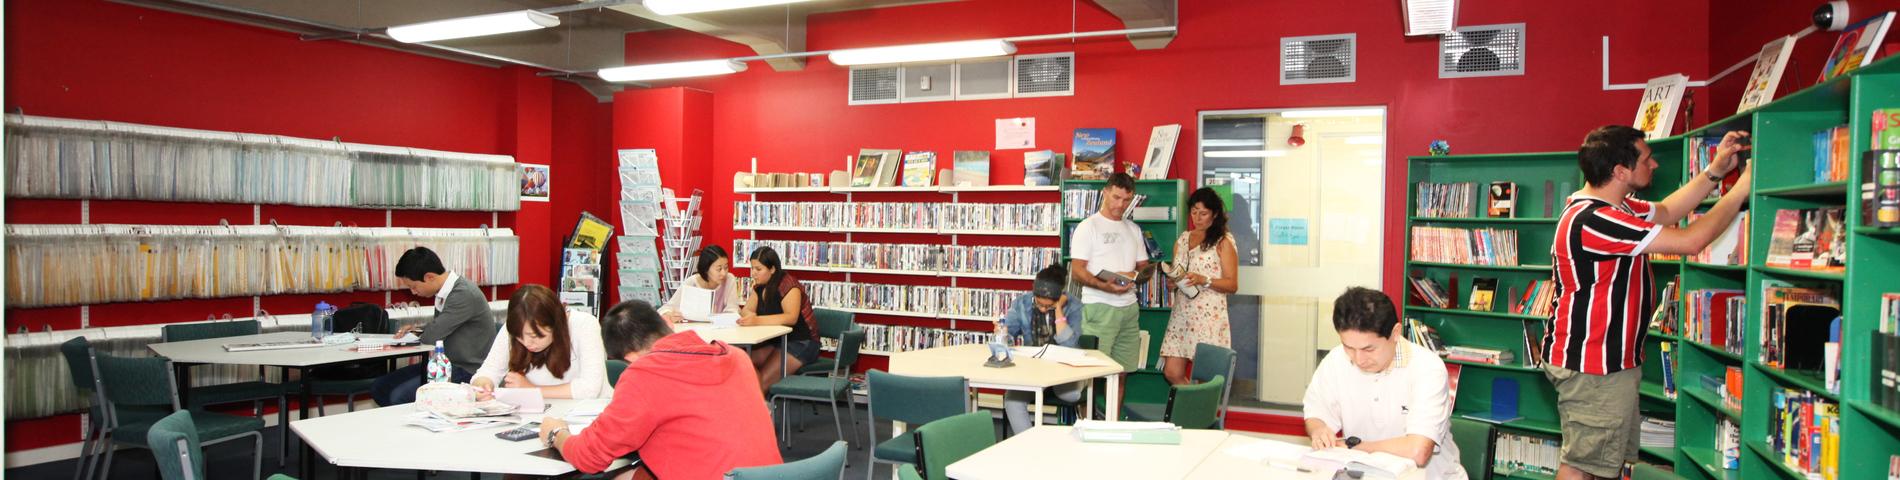 Worldwide School of English kép 1